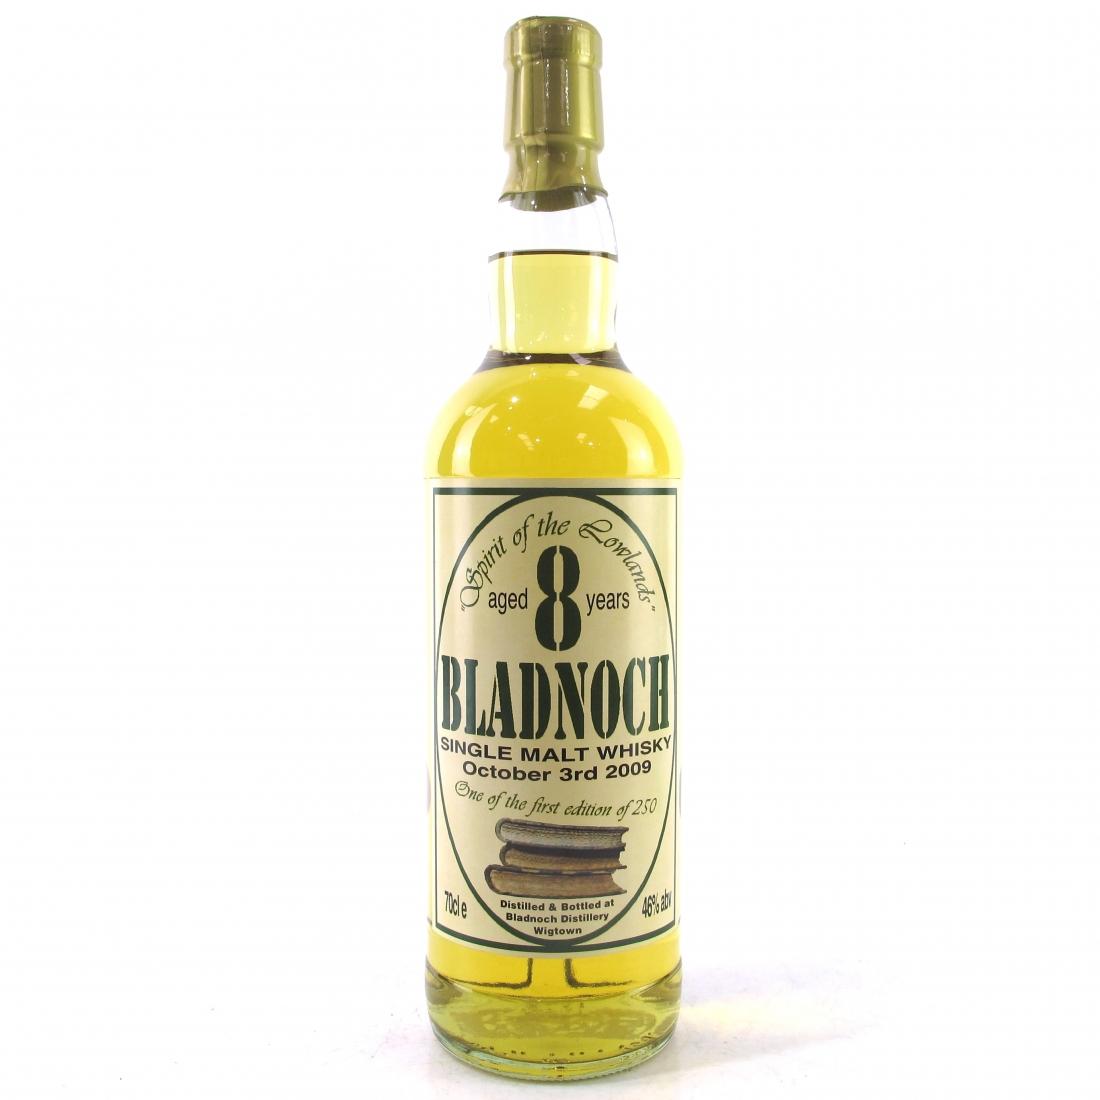 Bladnoch 8 Year Old / First Edition